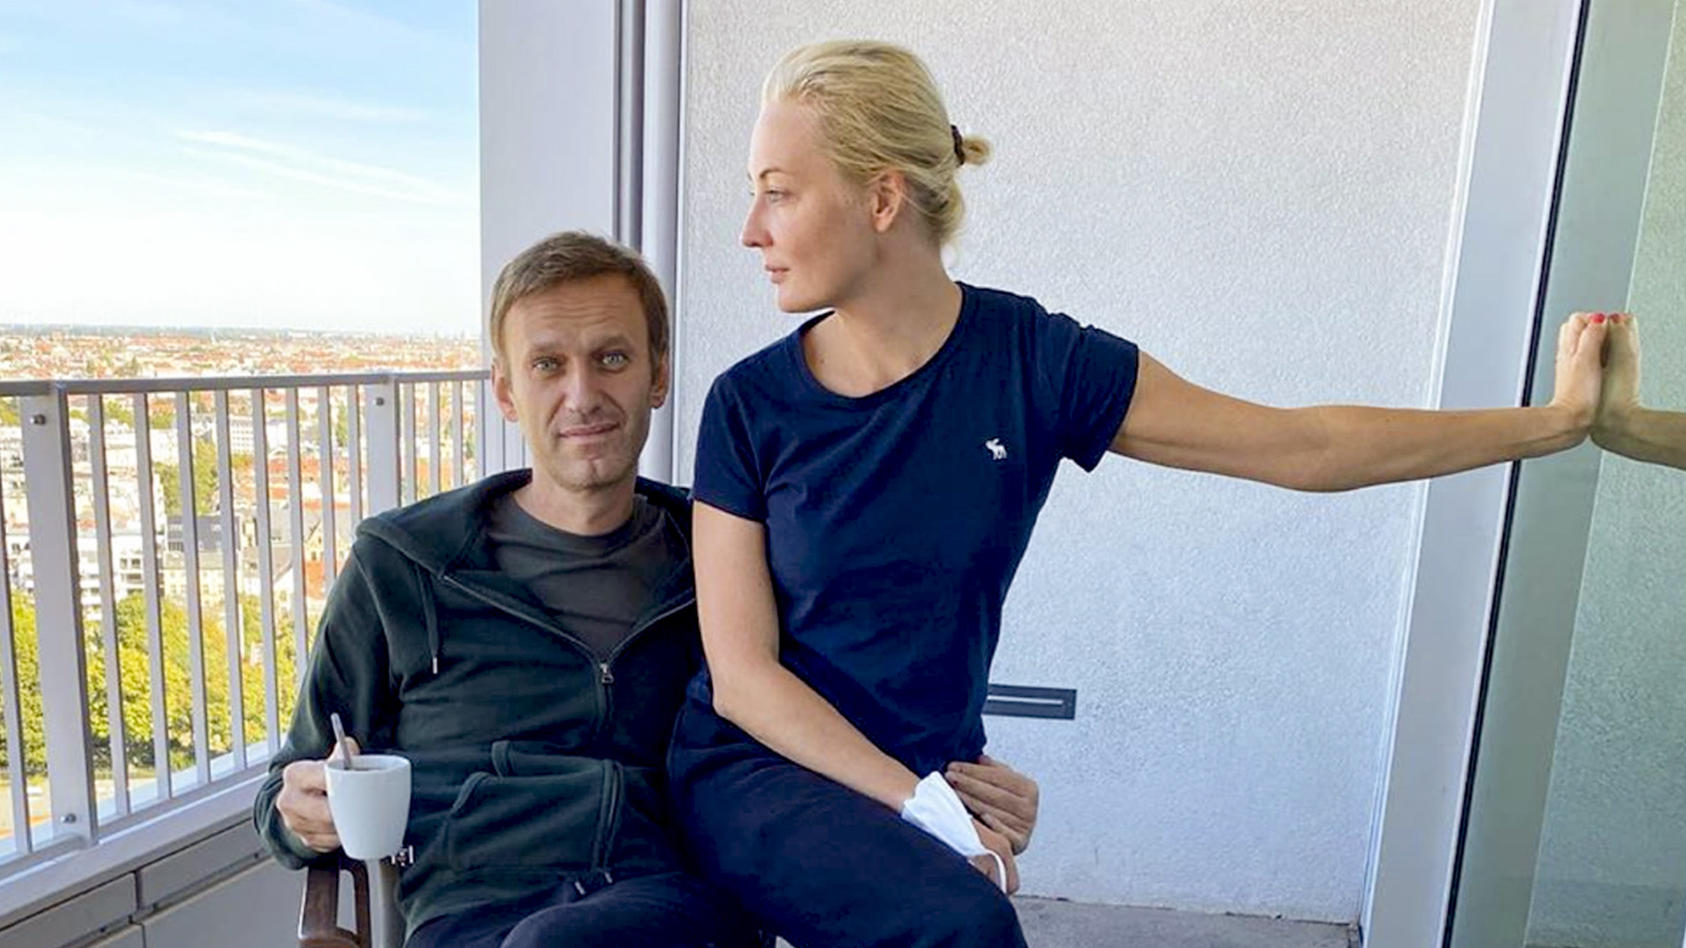 Kremlkritiker Nawalny beschuldigt Wladimir Putin